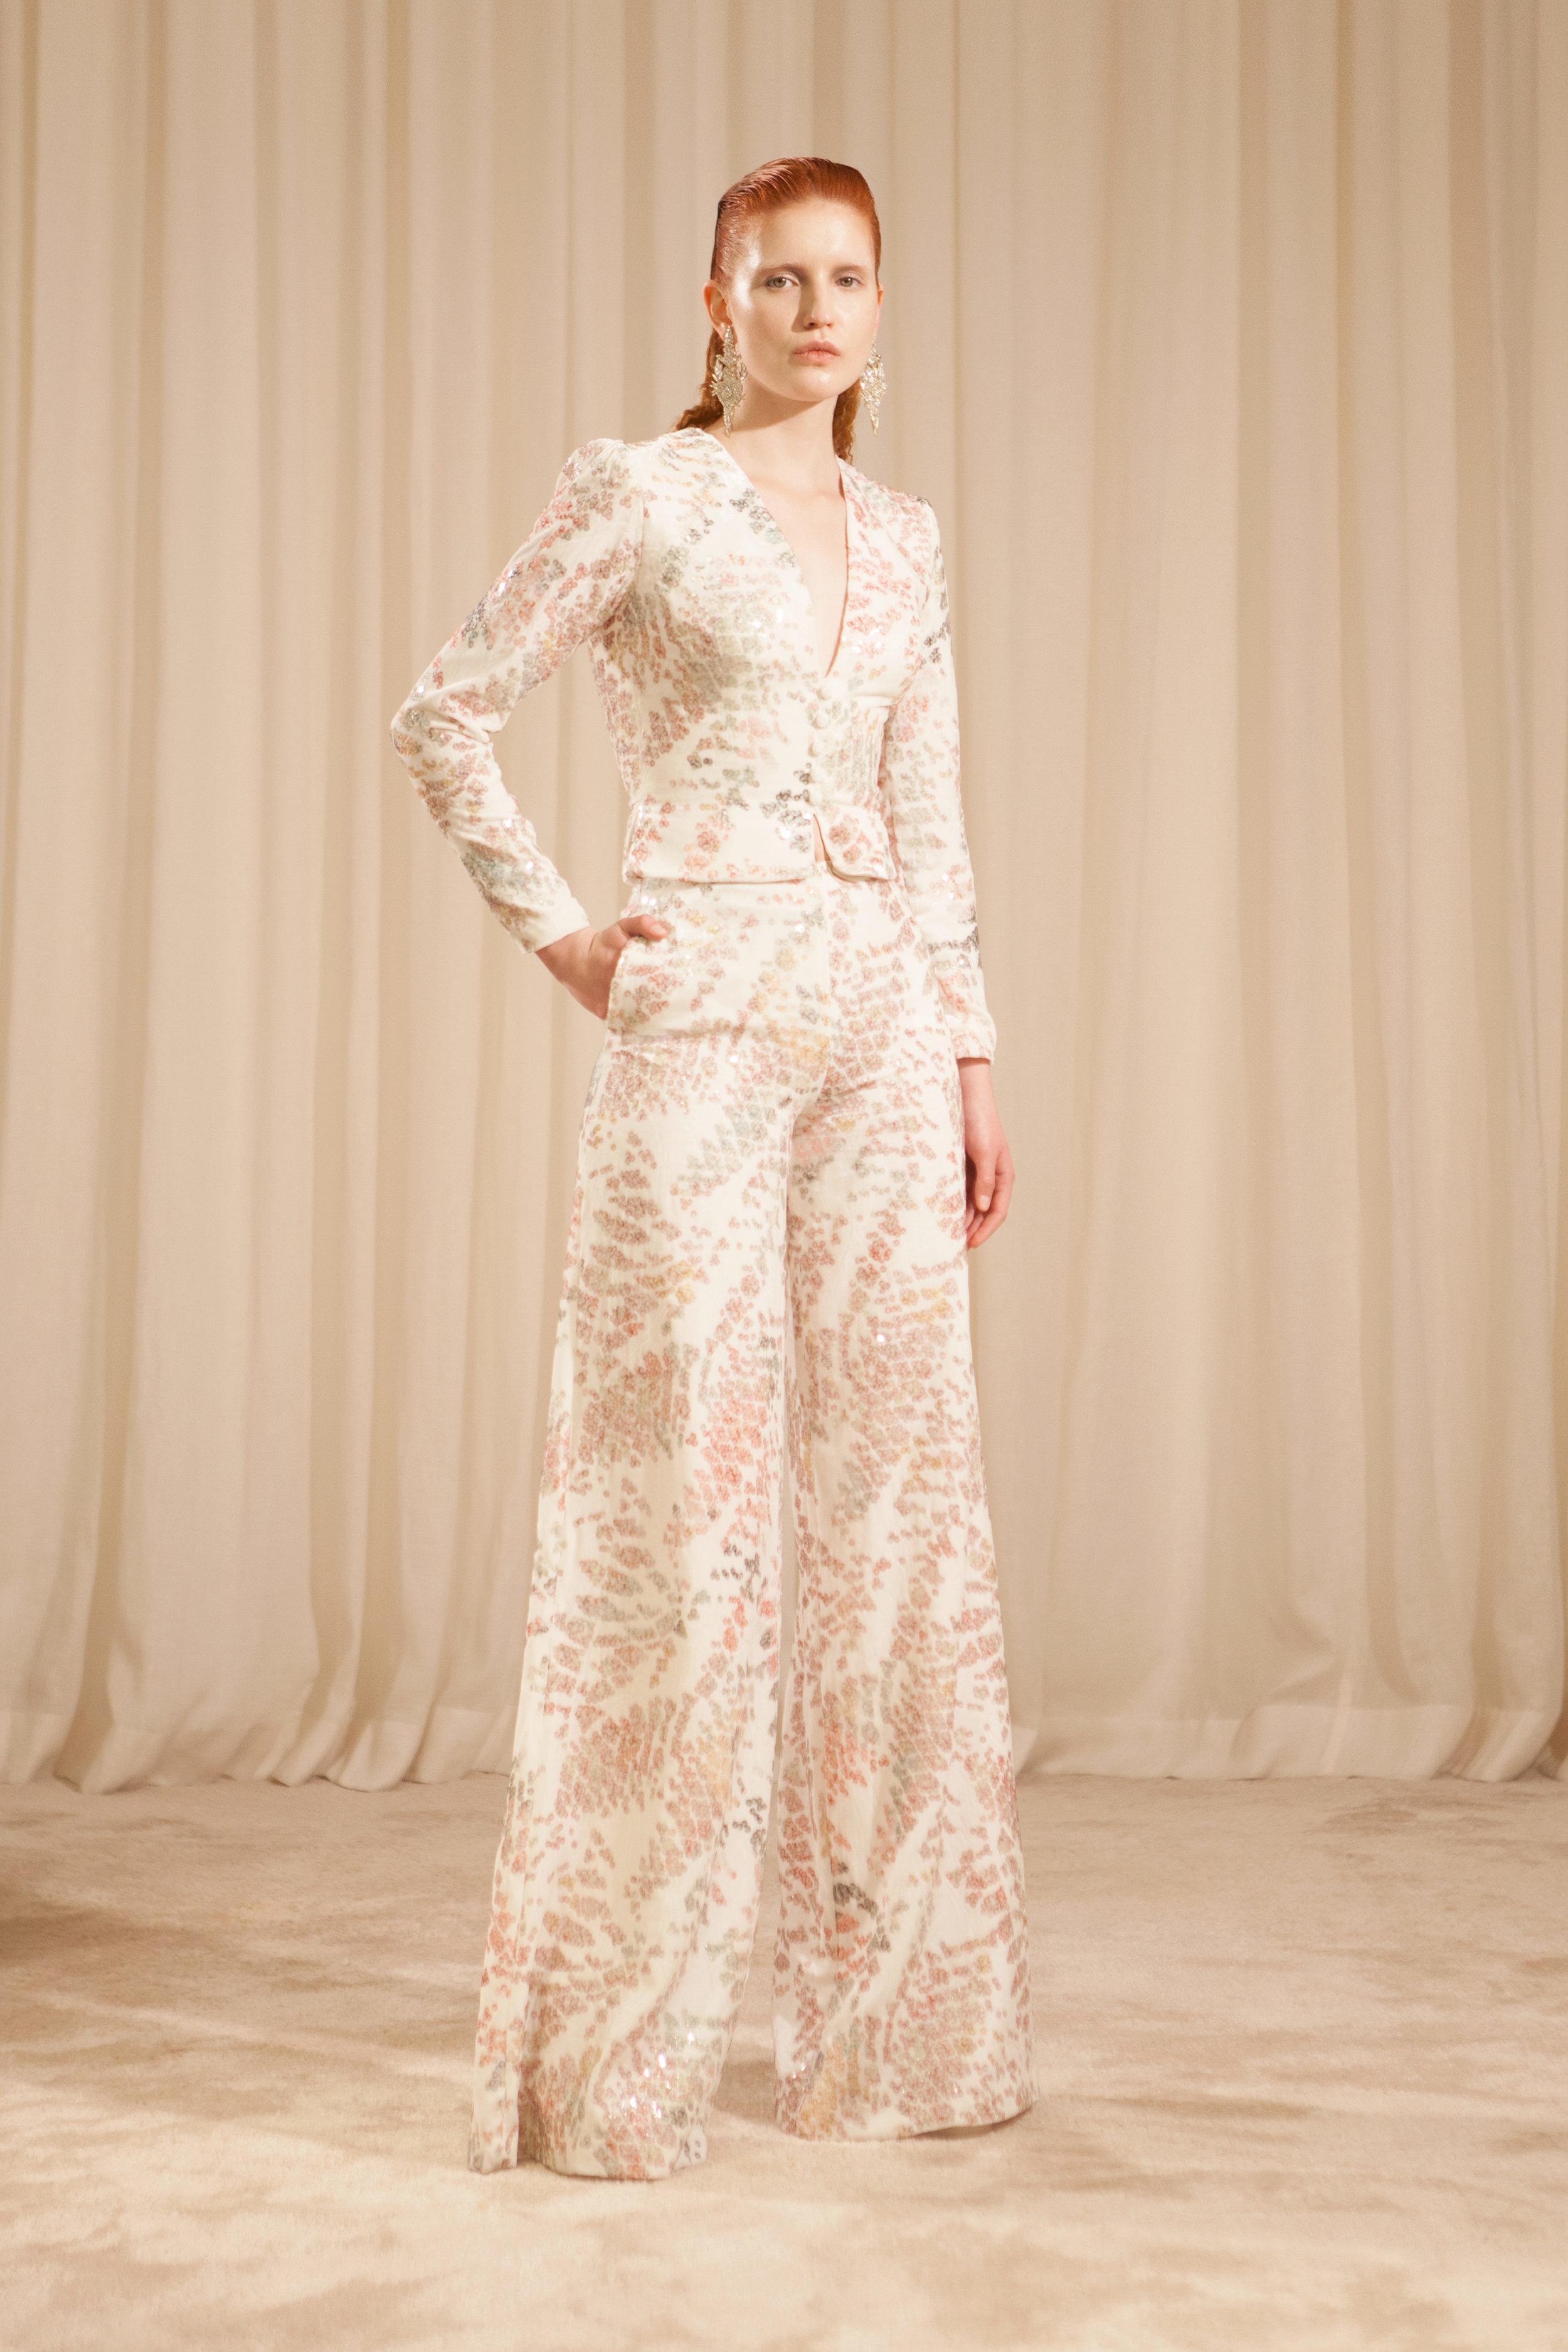 SandraMansour-S1-Lookbook-Bridal-12.jpg